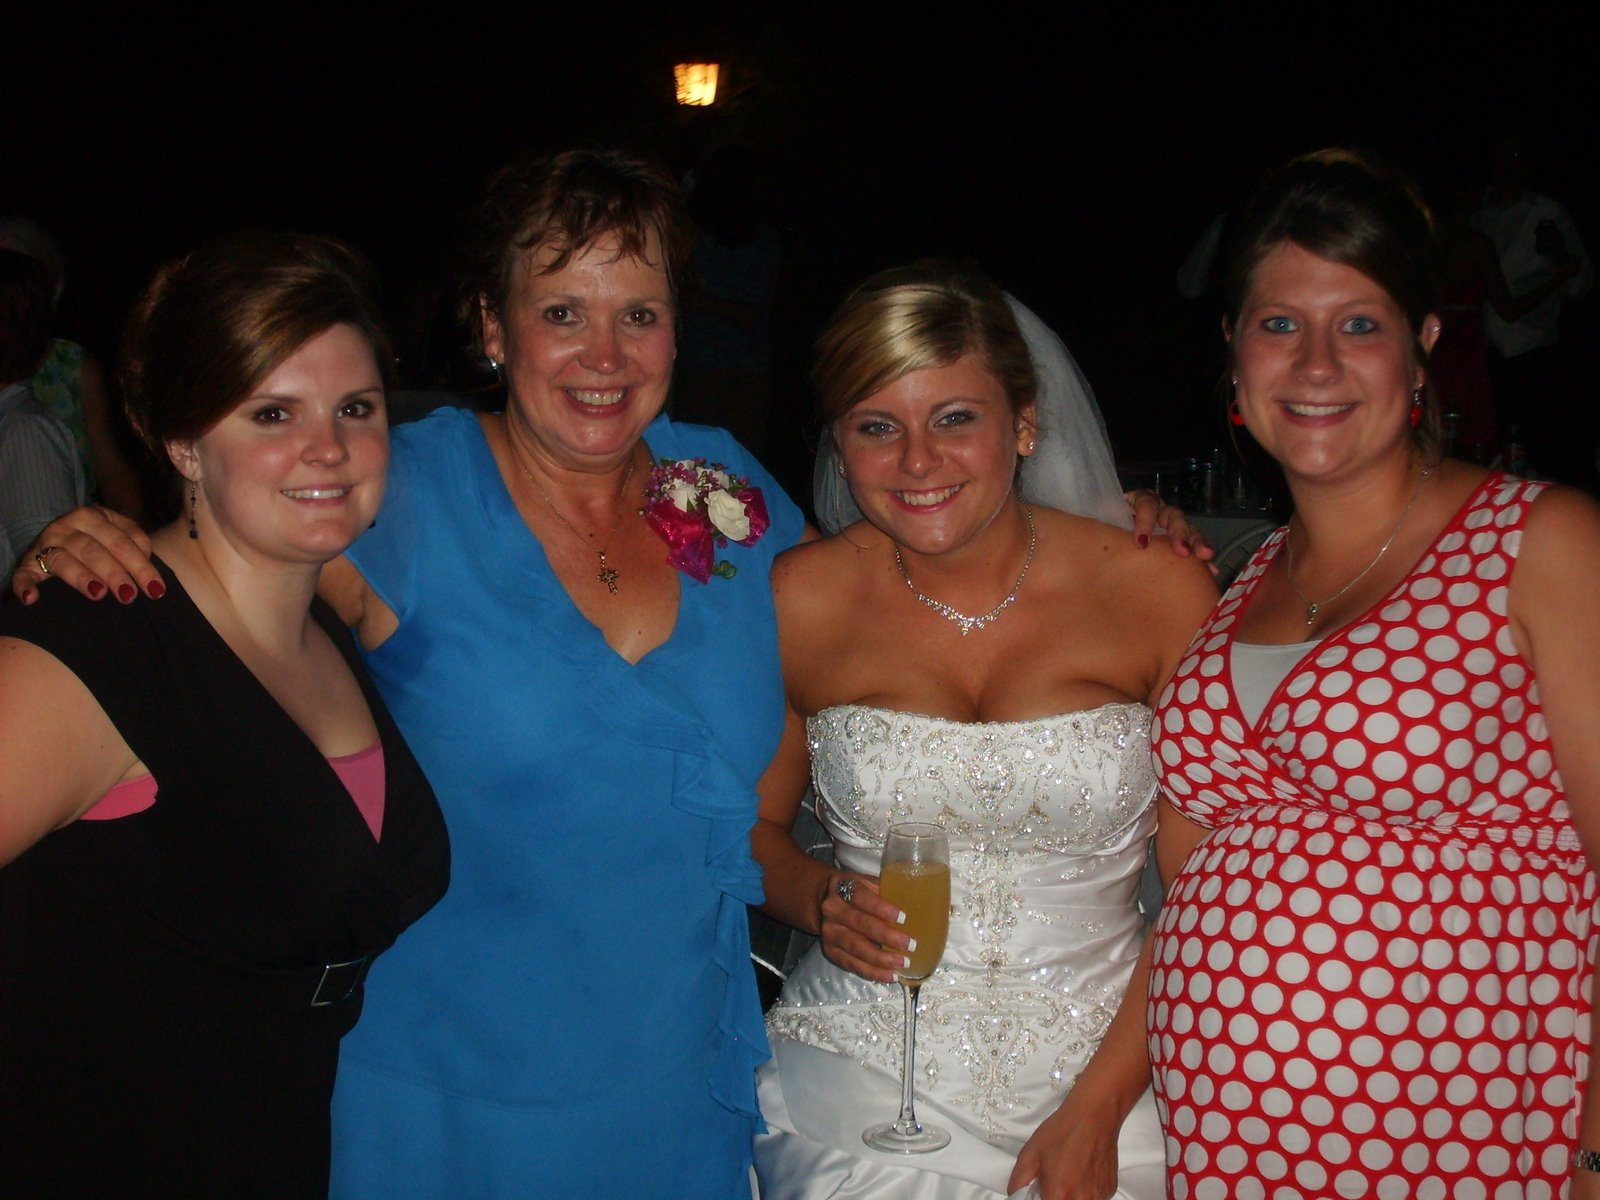 [Casey+&+Jess'+Wedding+009.jpg]